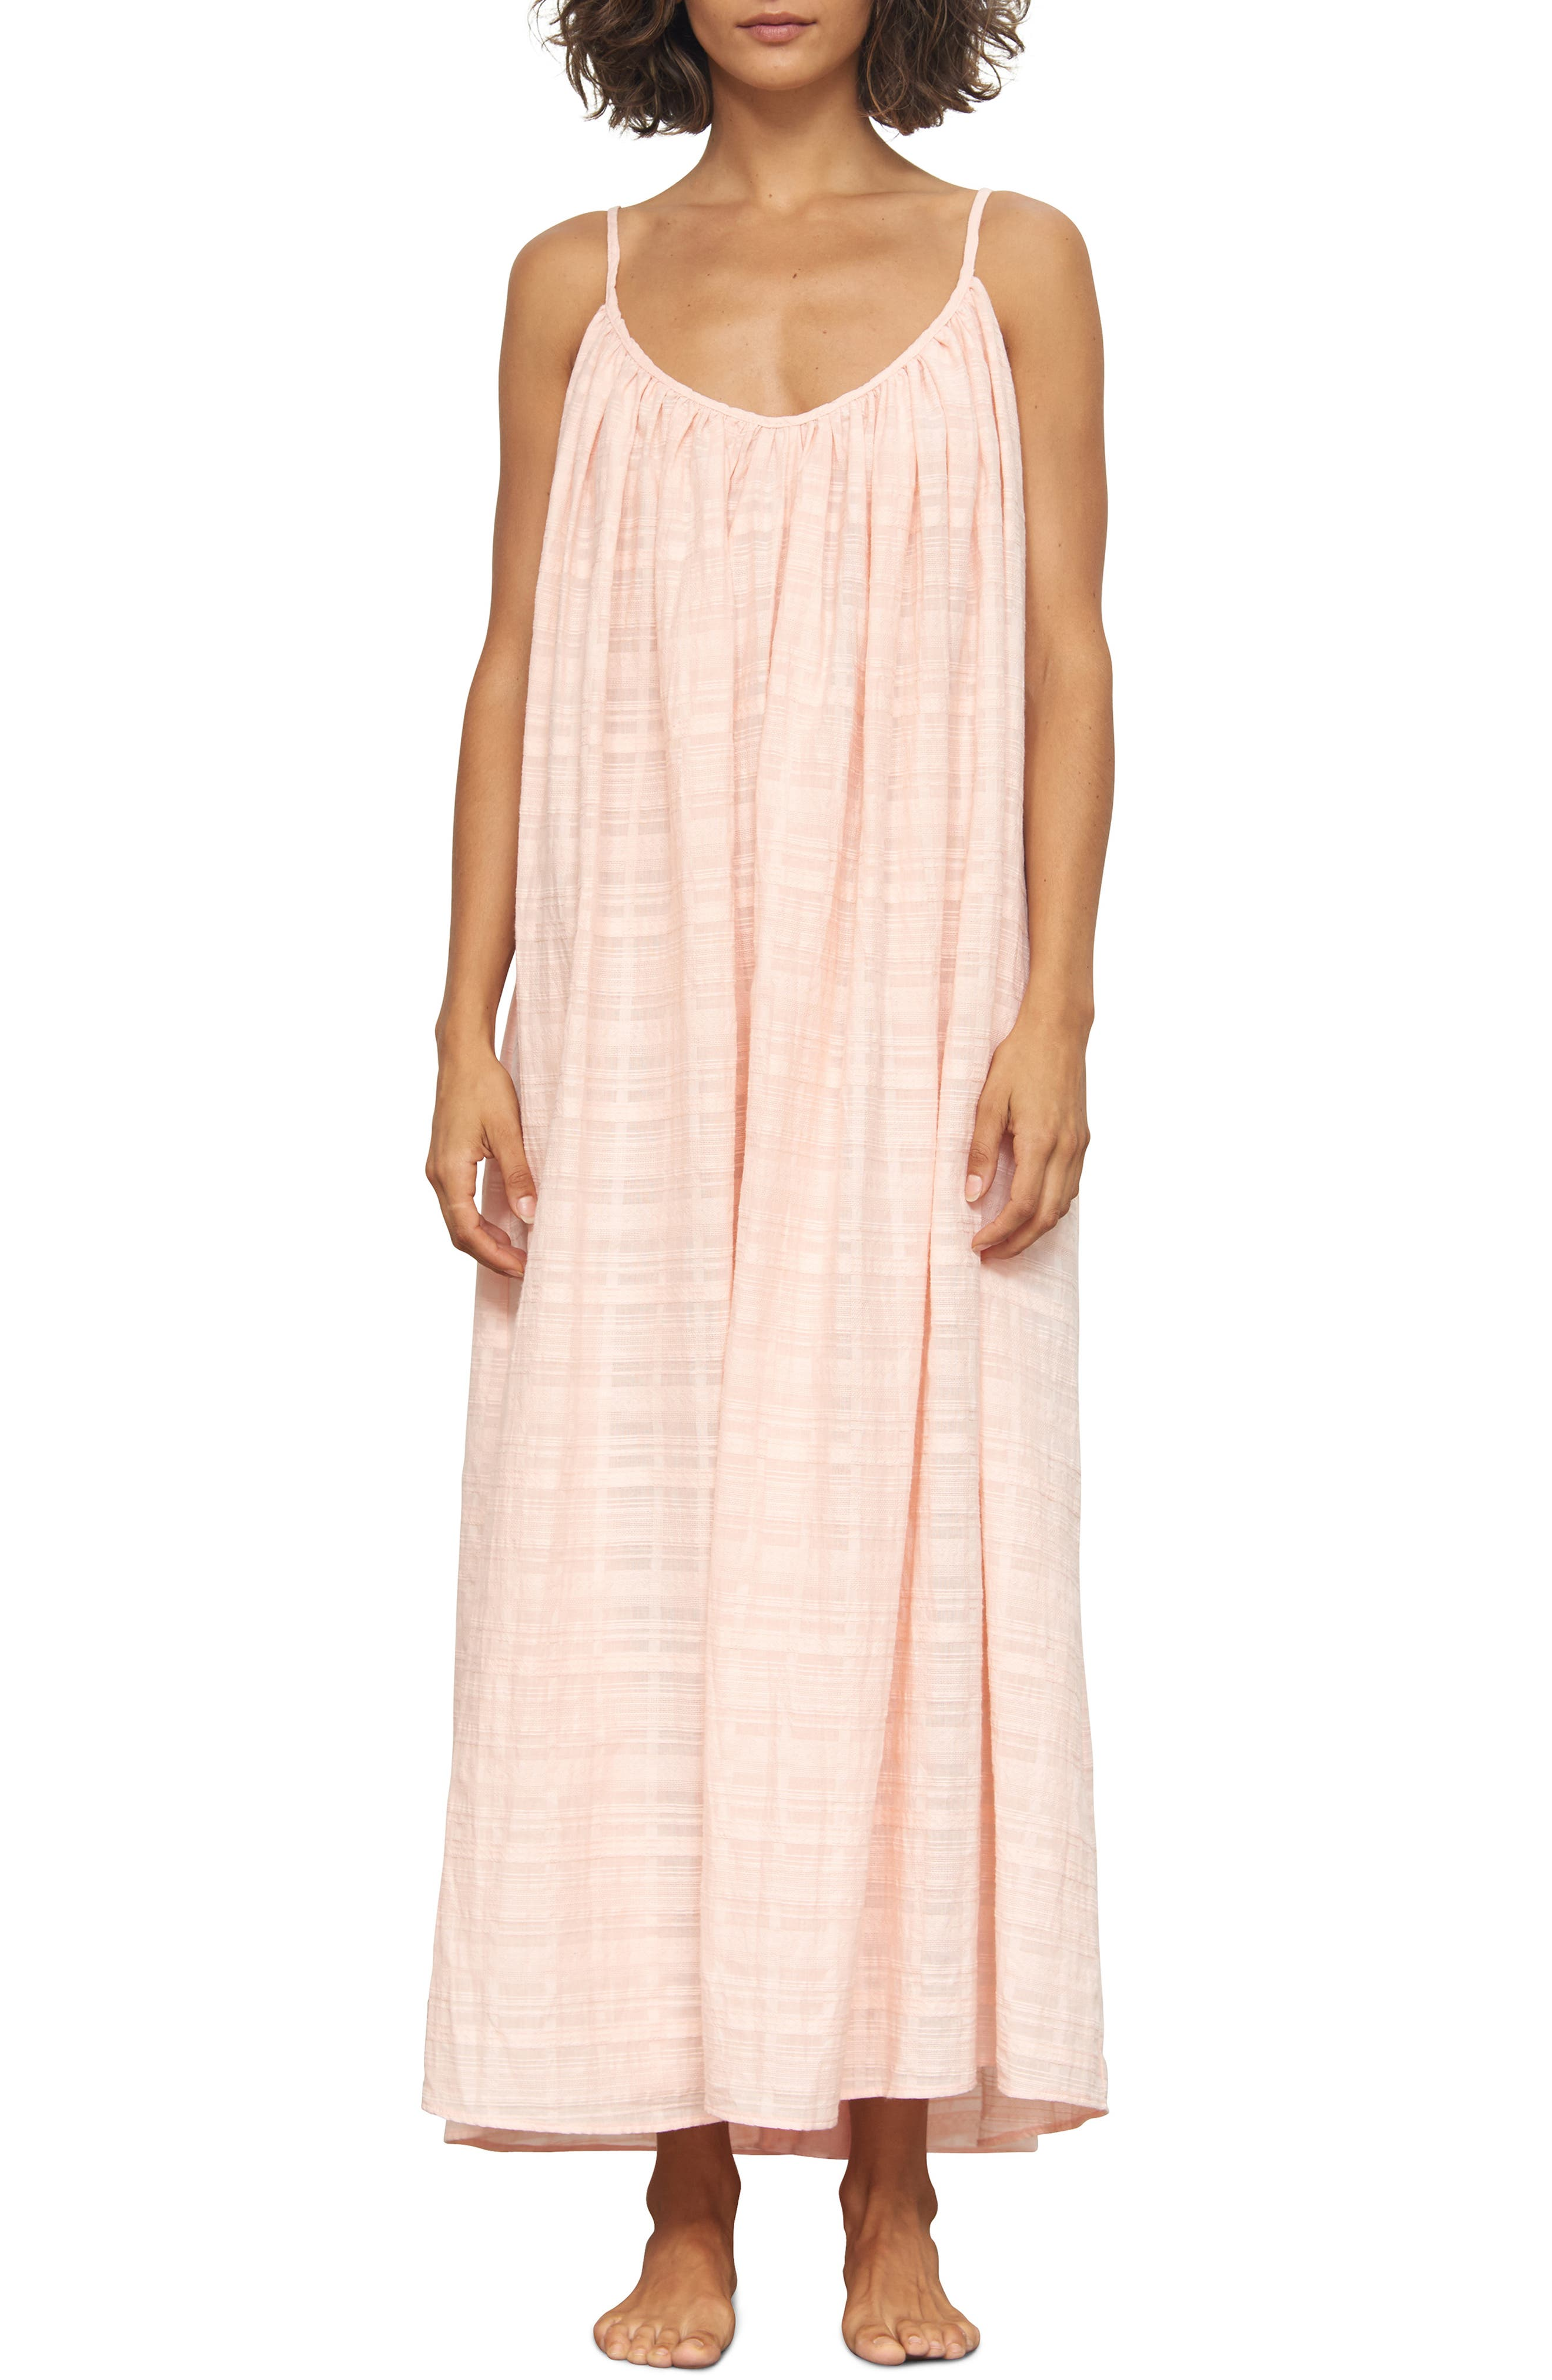 Mara Hoffman Fiona Cover-Up Dress, Pink